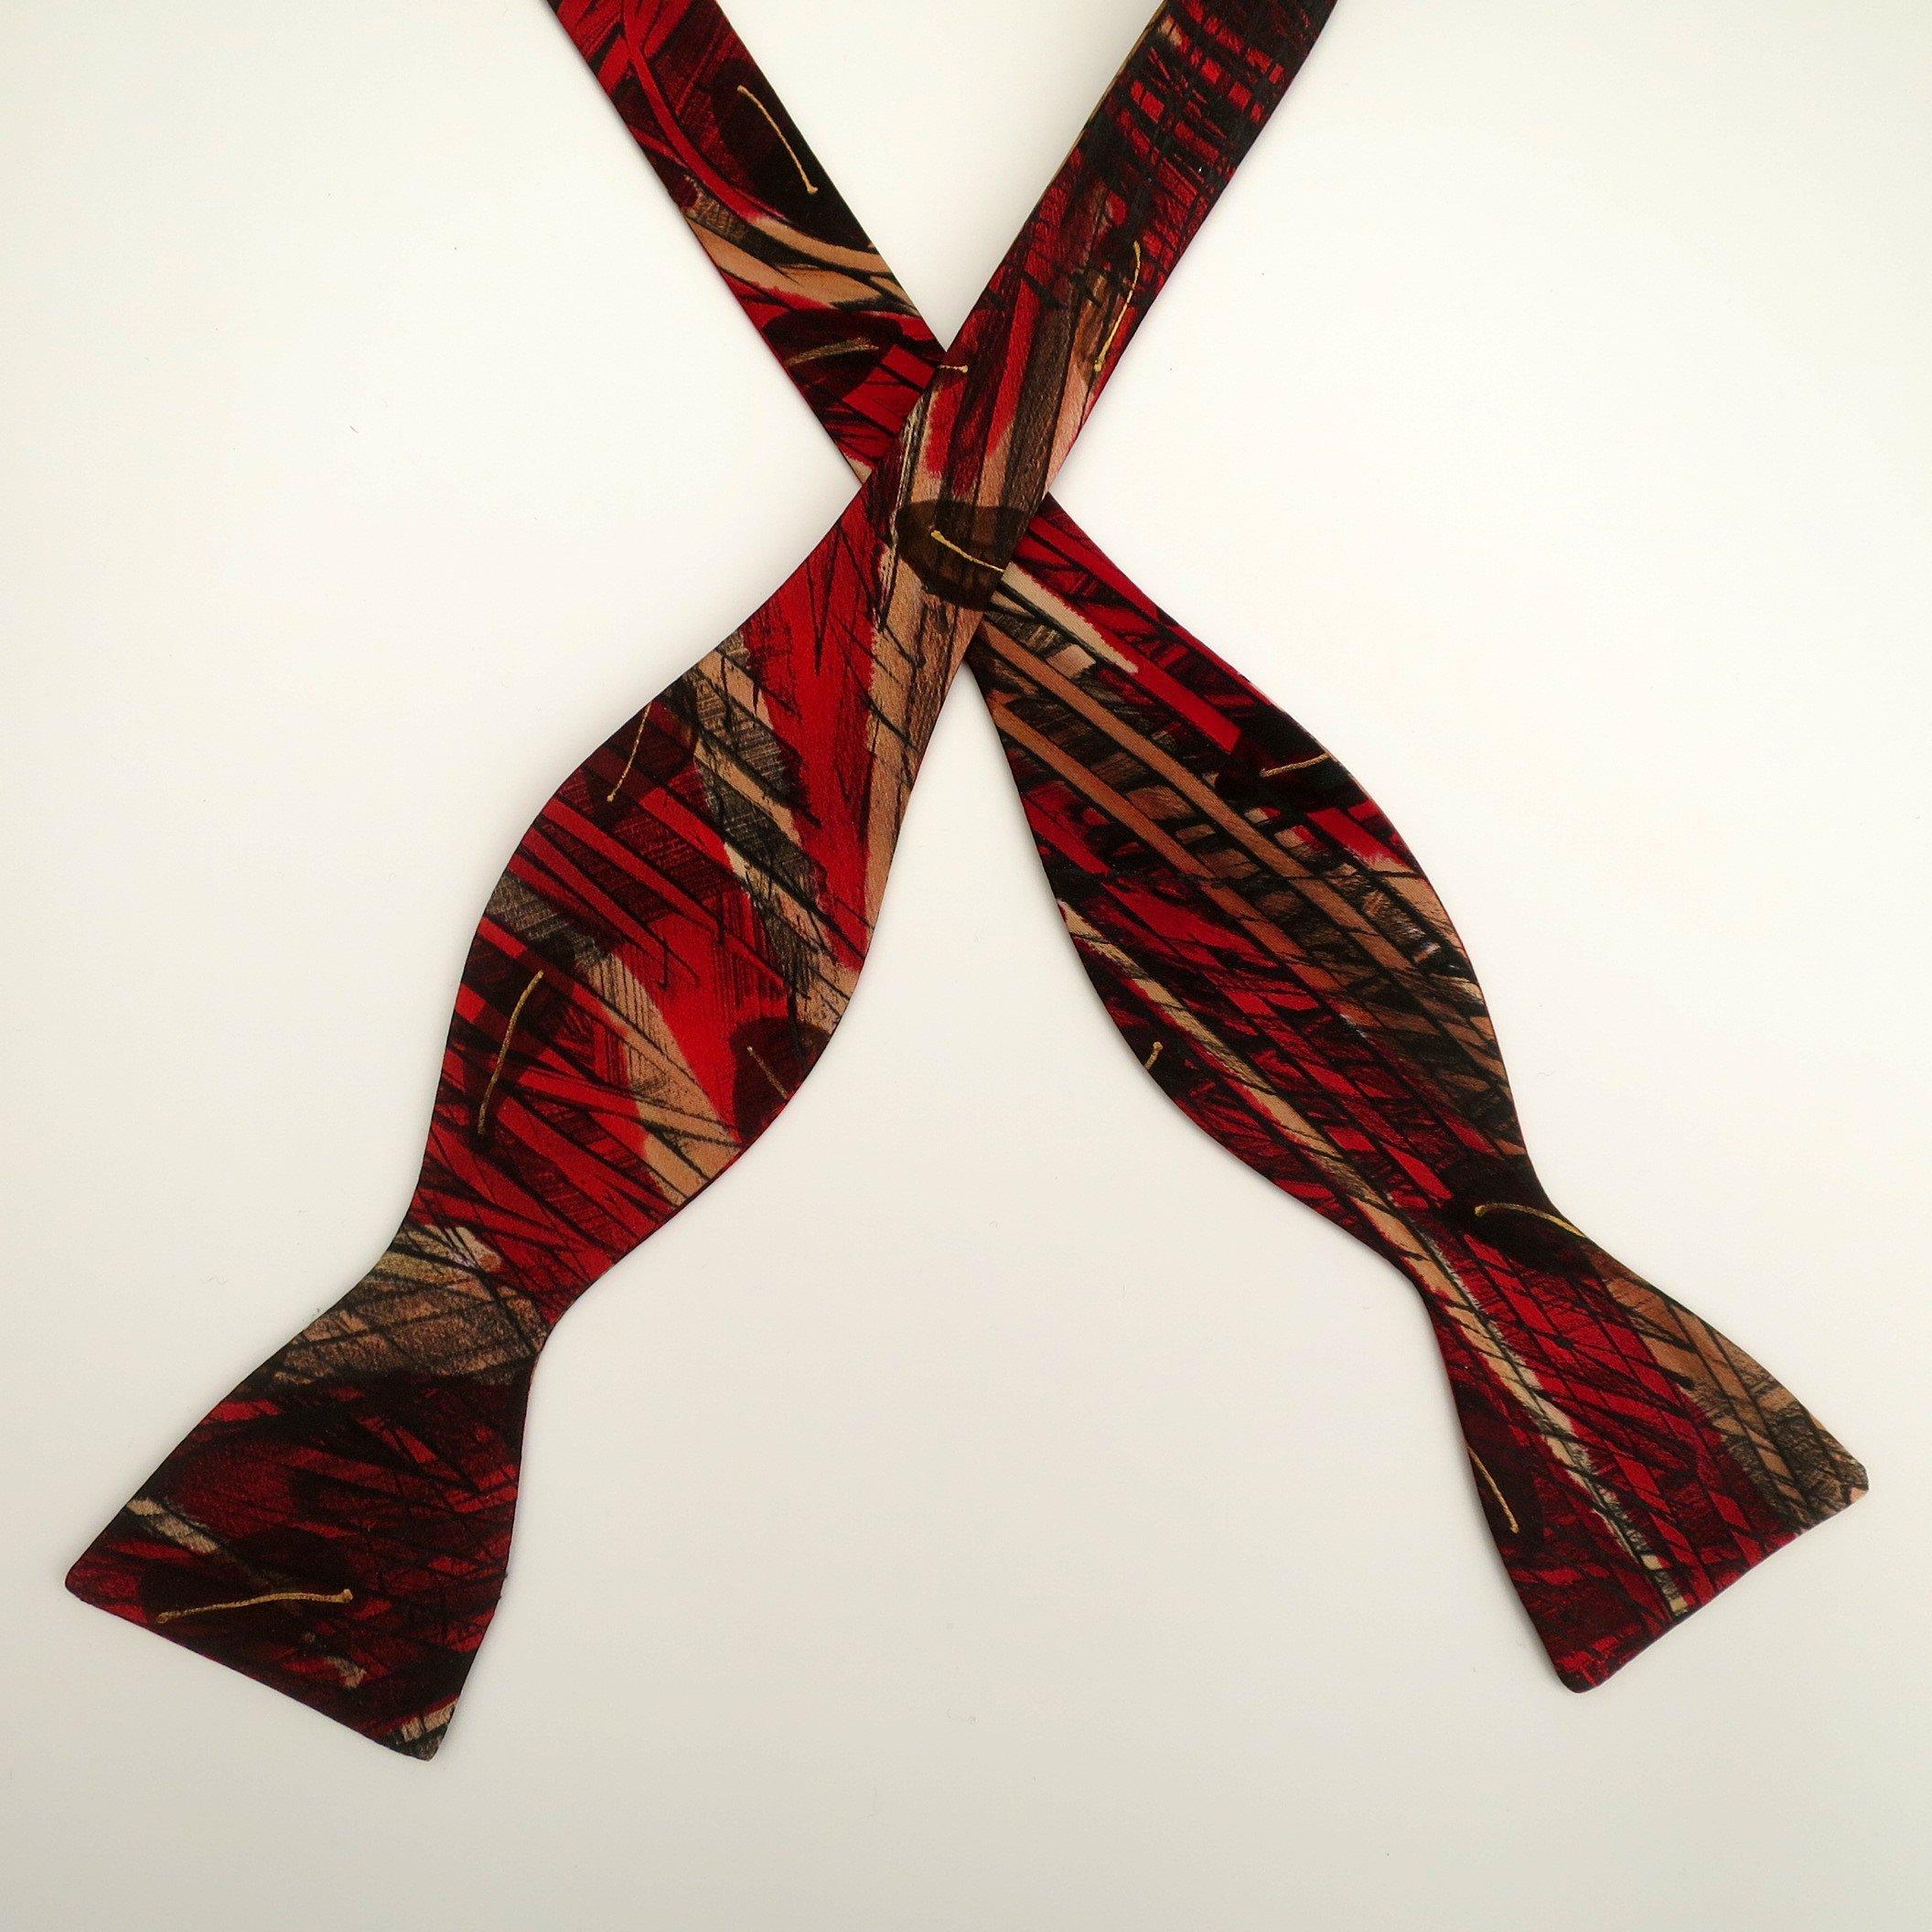 100% Silk Hand-Painted Hand-Made Men's Self Tie Bow Tie ''Scarlet Leaf'' Art to Wear by Murphyties